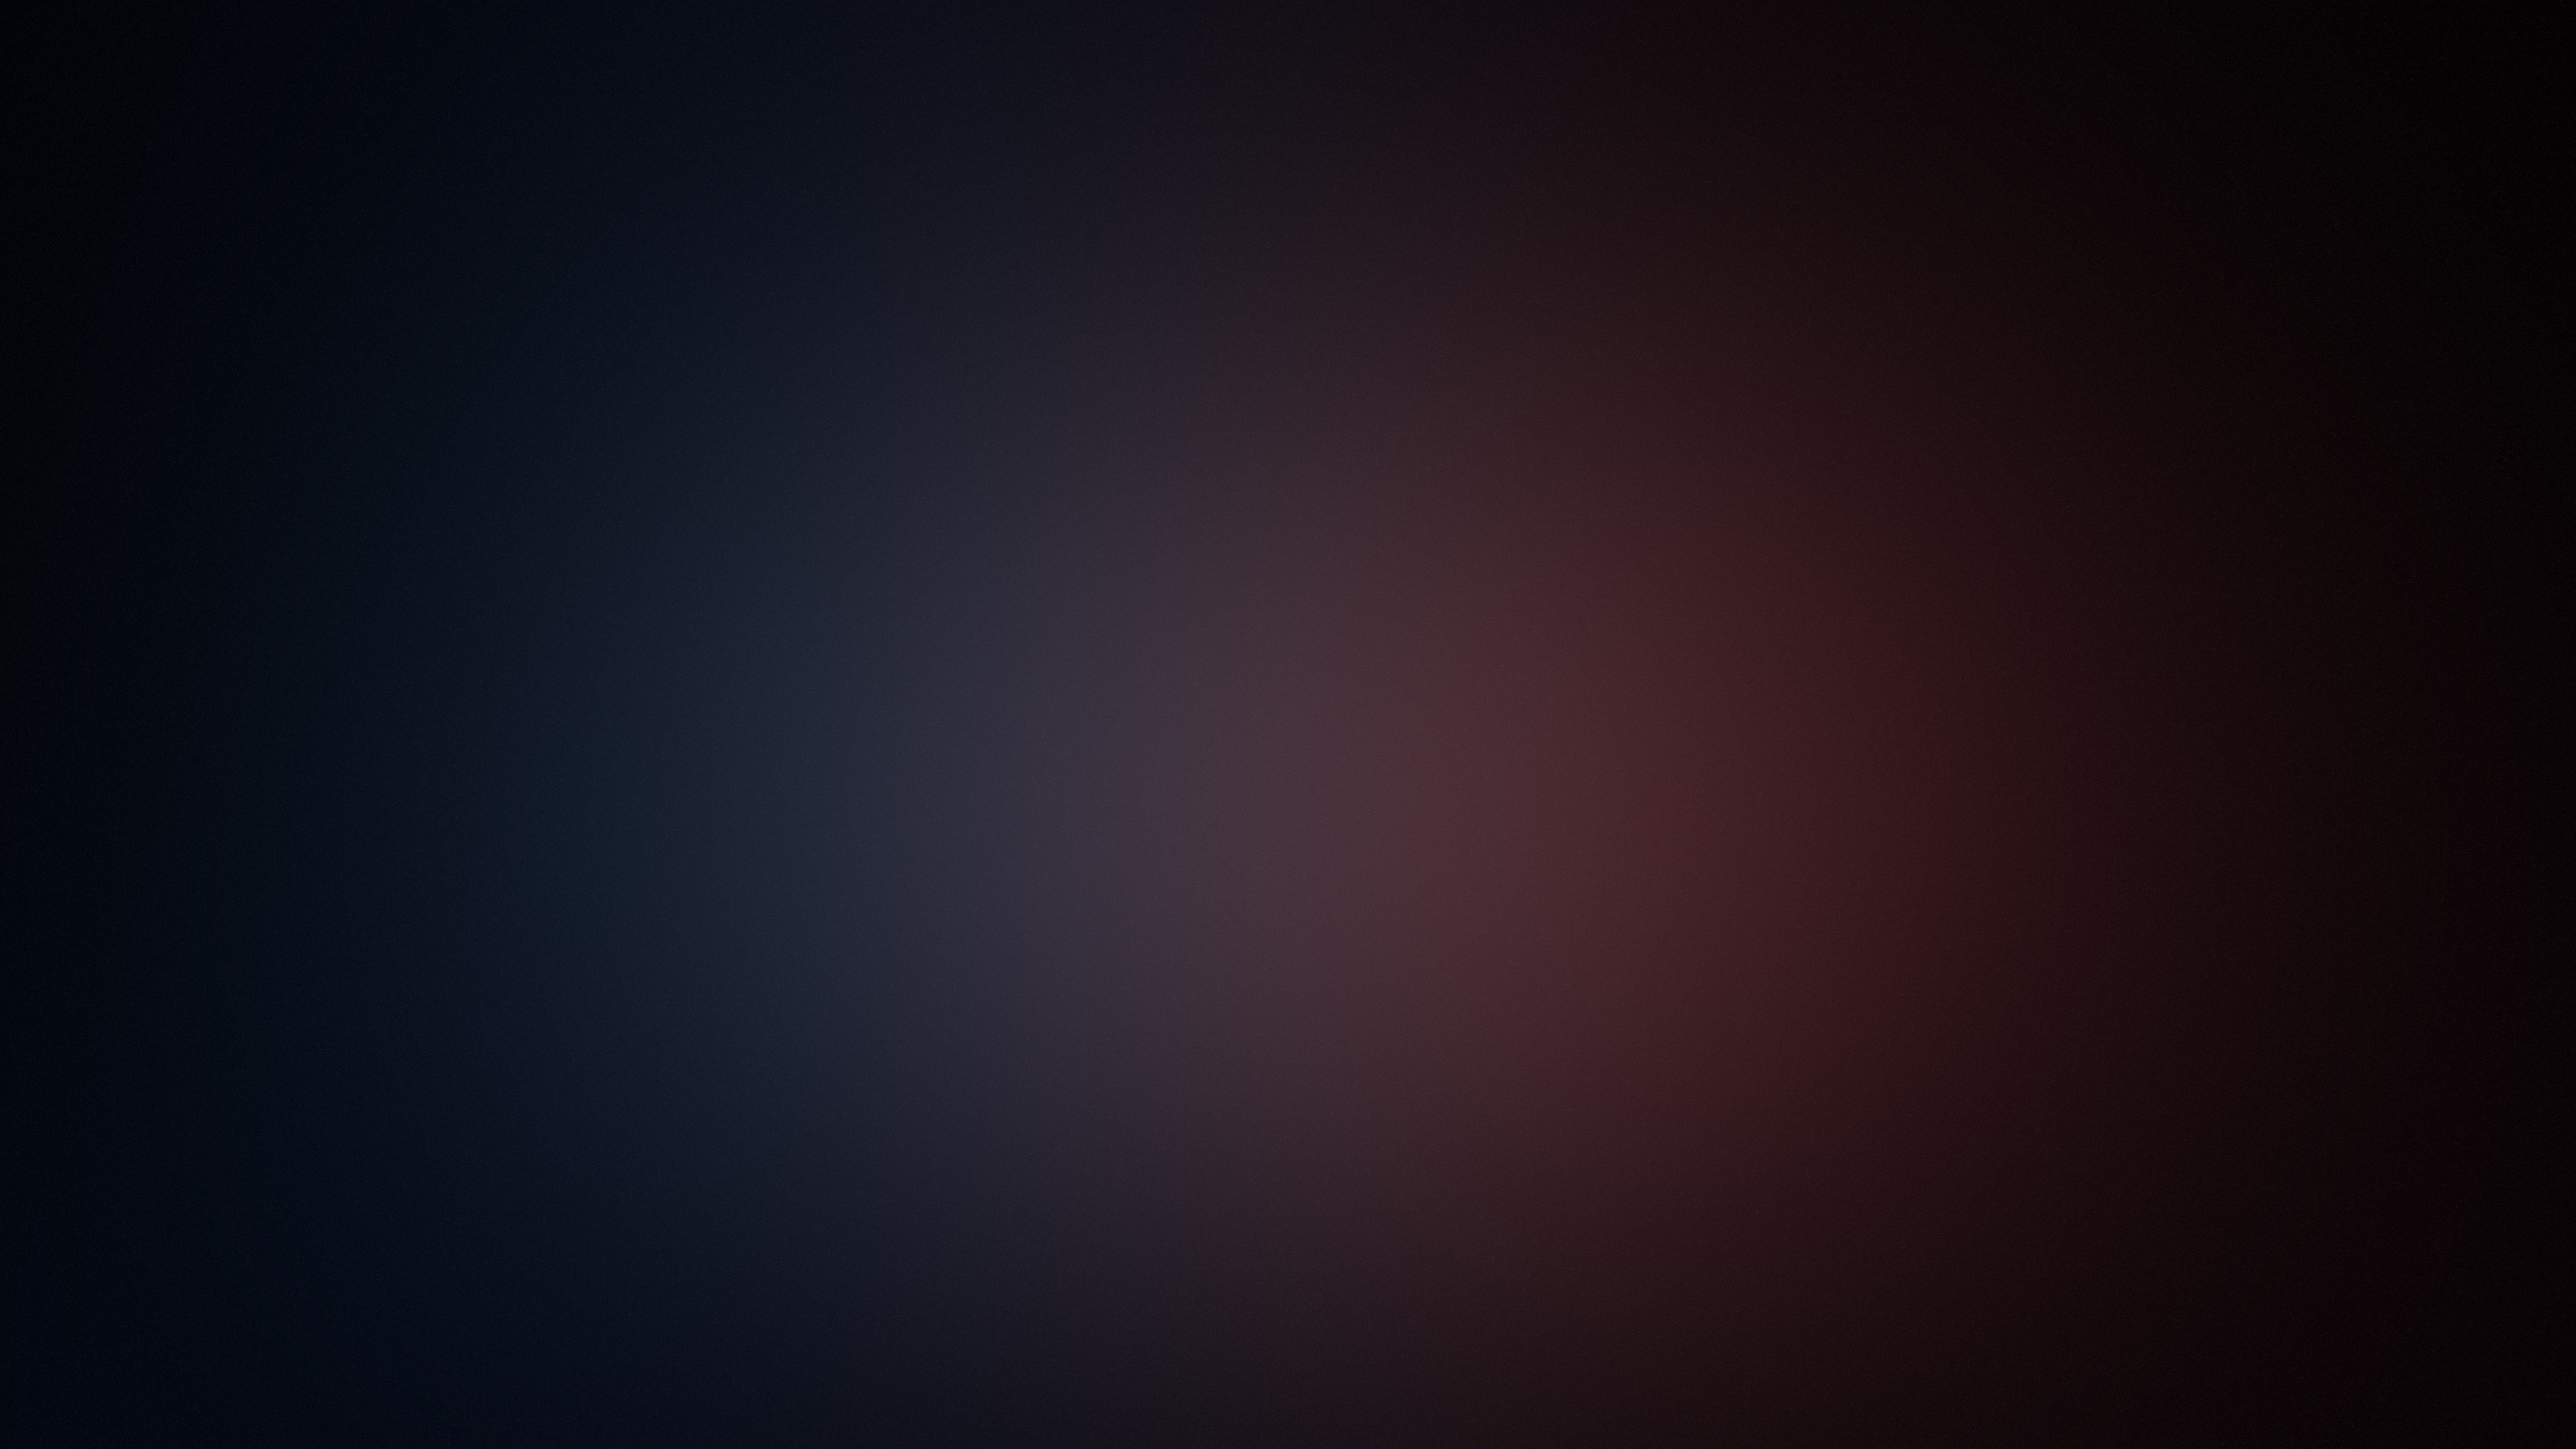 Wallpaper 4k Simple Subtle Abstract Dark Minimalism 4k 4k